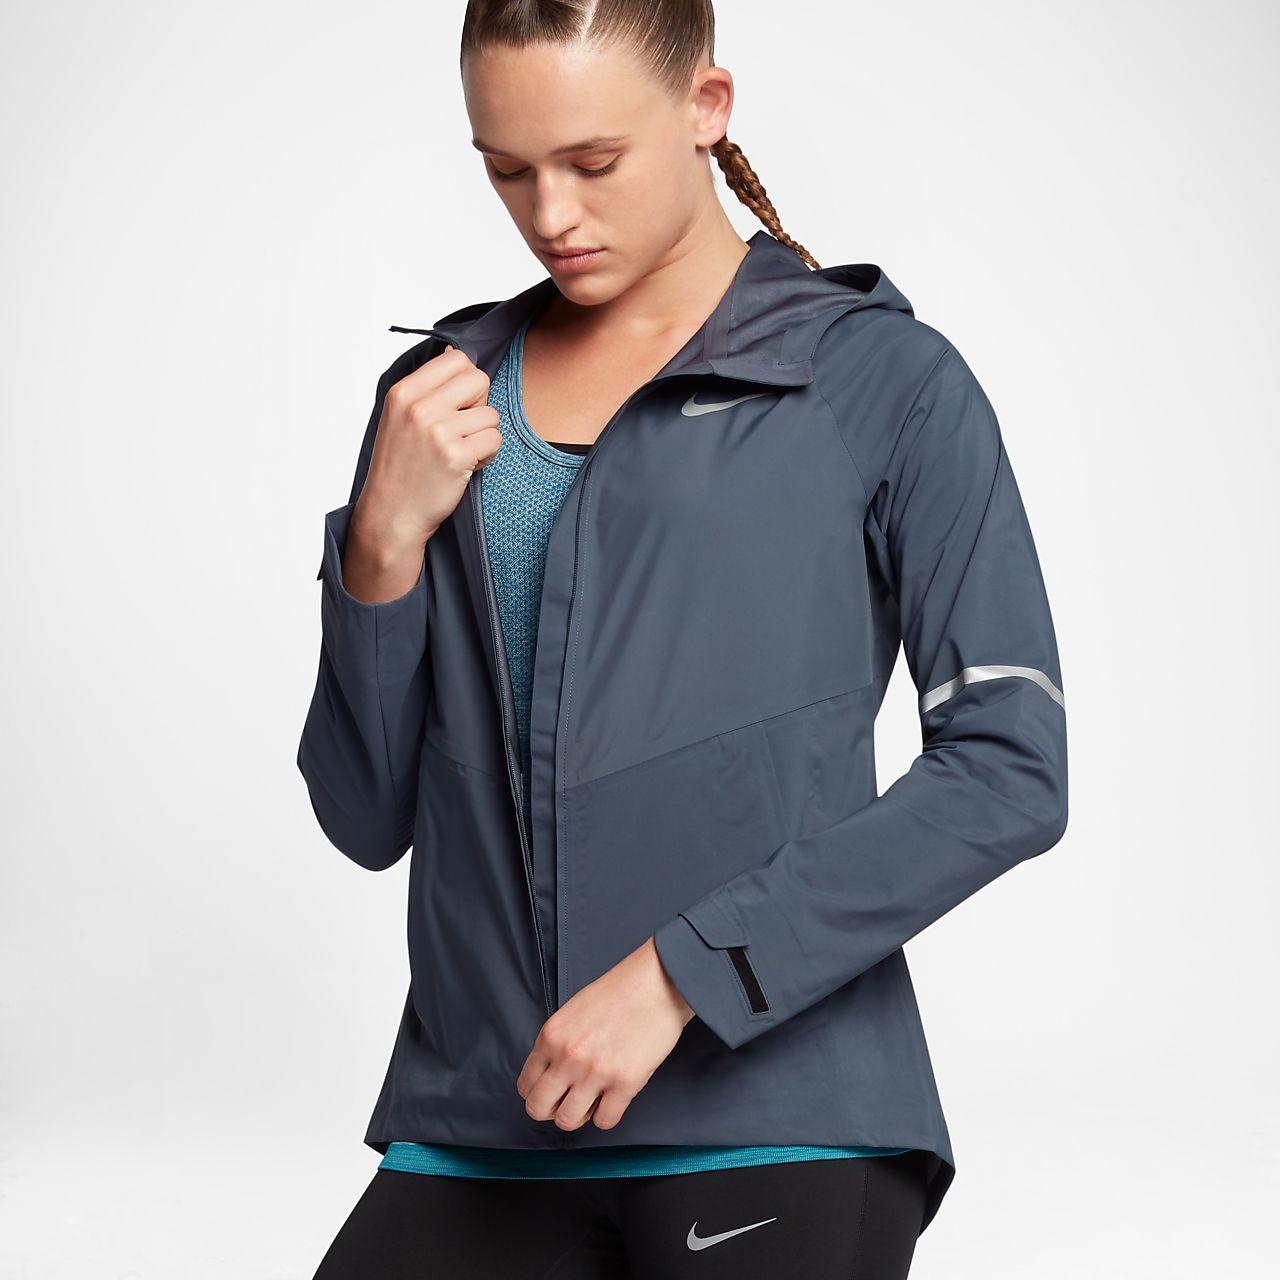 df57c20f06a77 Nike Zonal AeroShield Women's Running Jacket   Active wear   Running ...